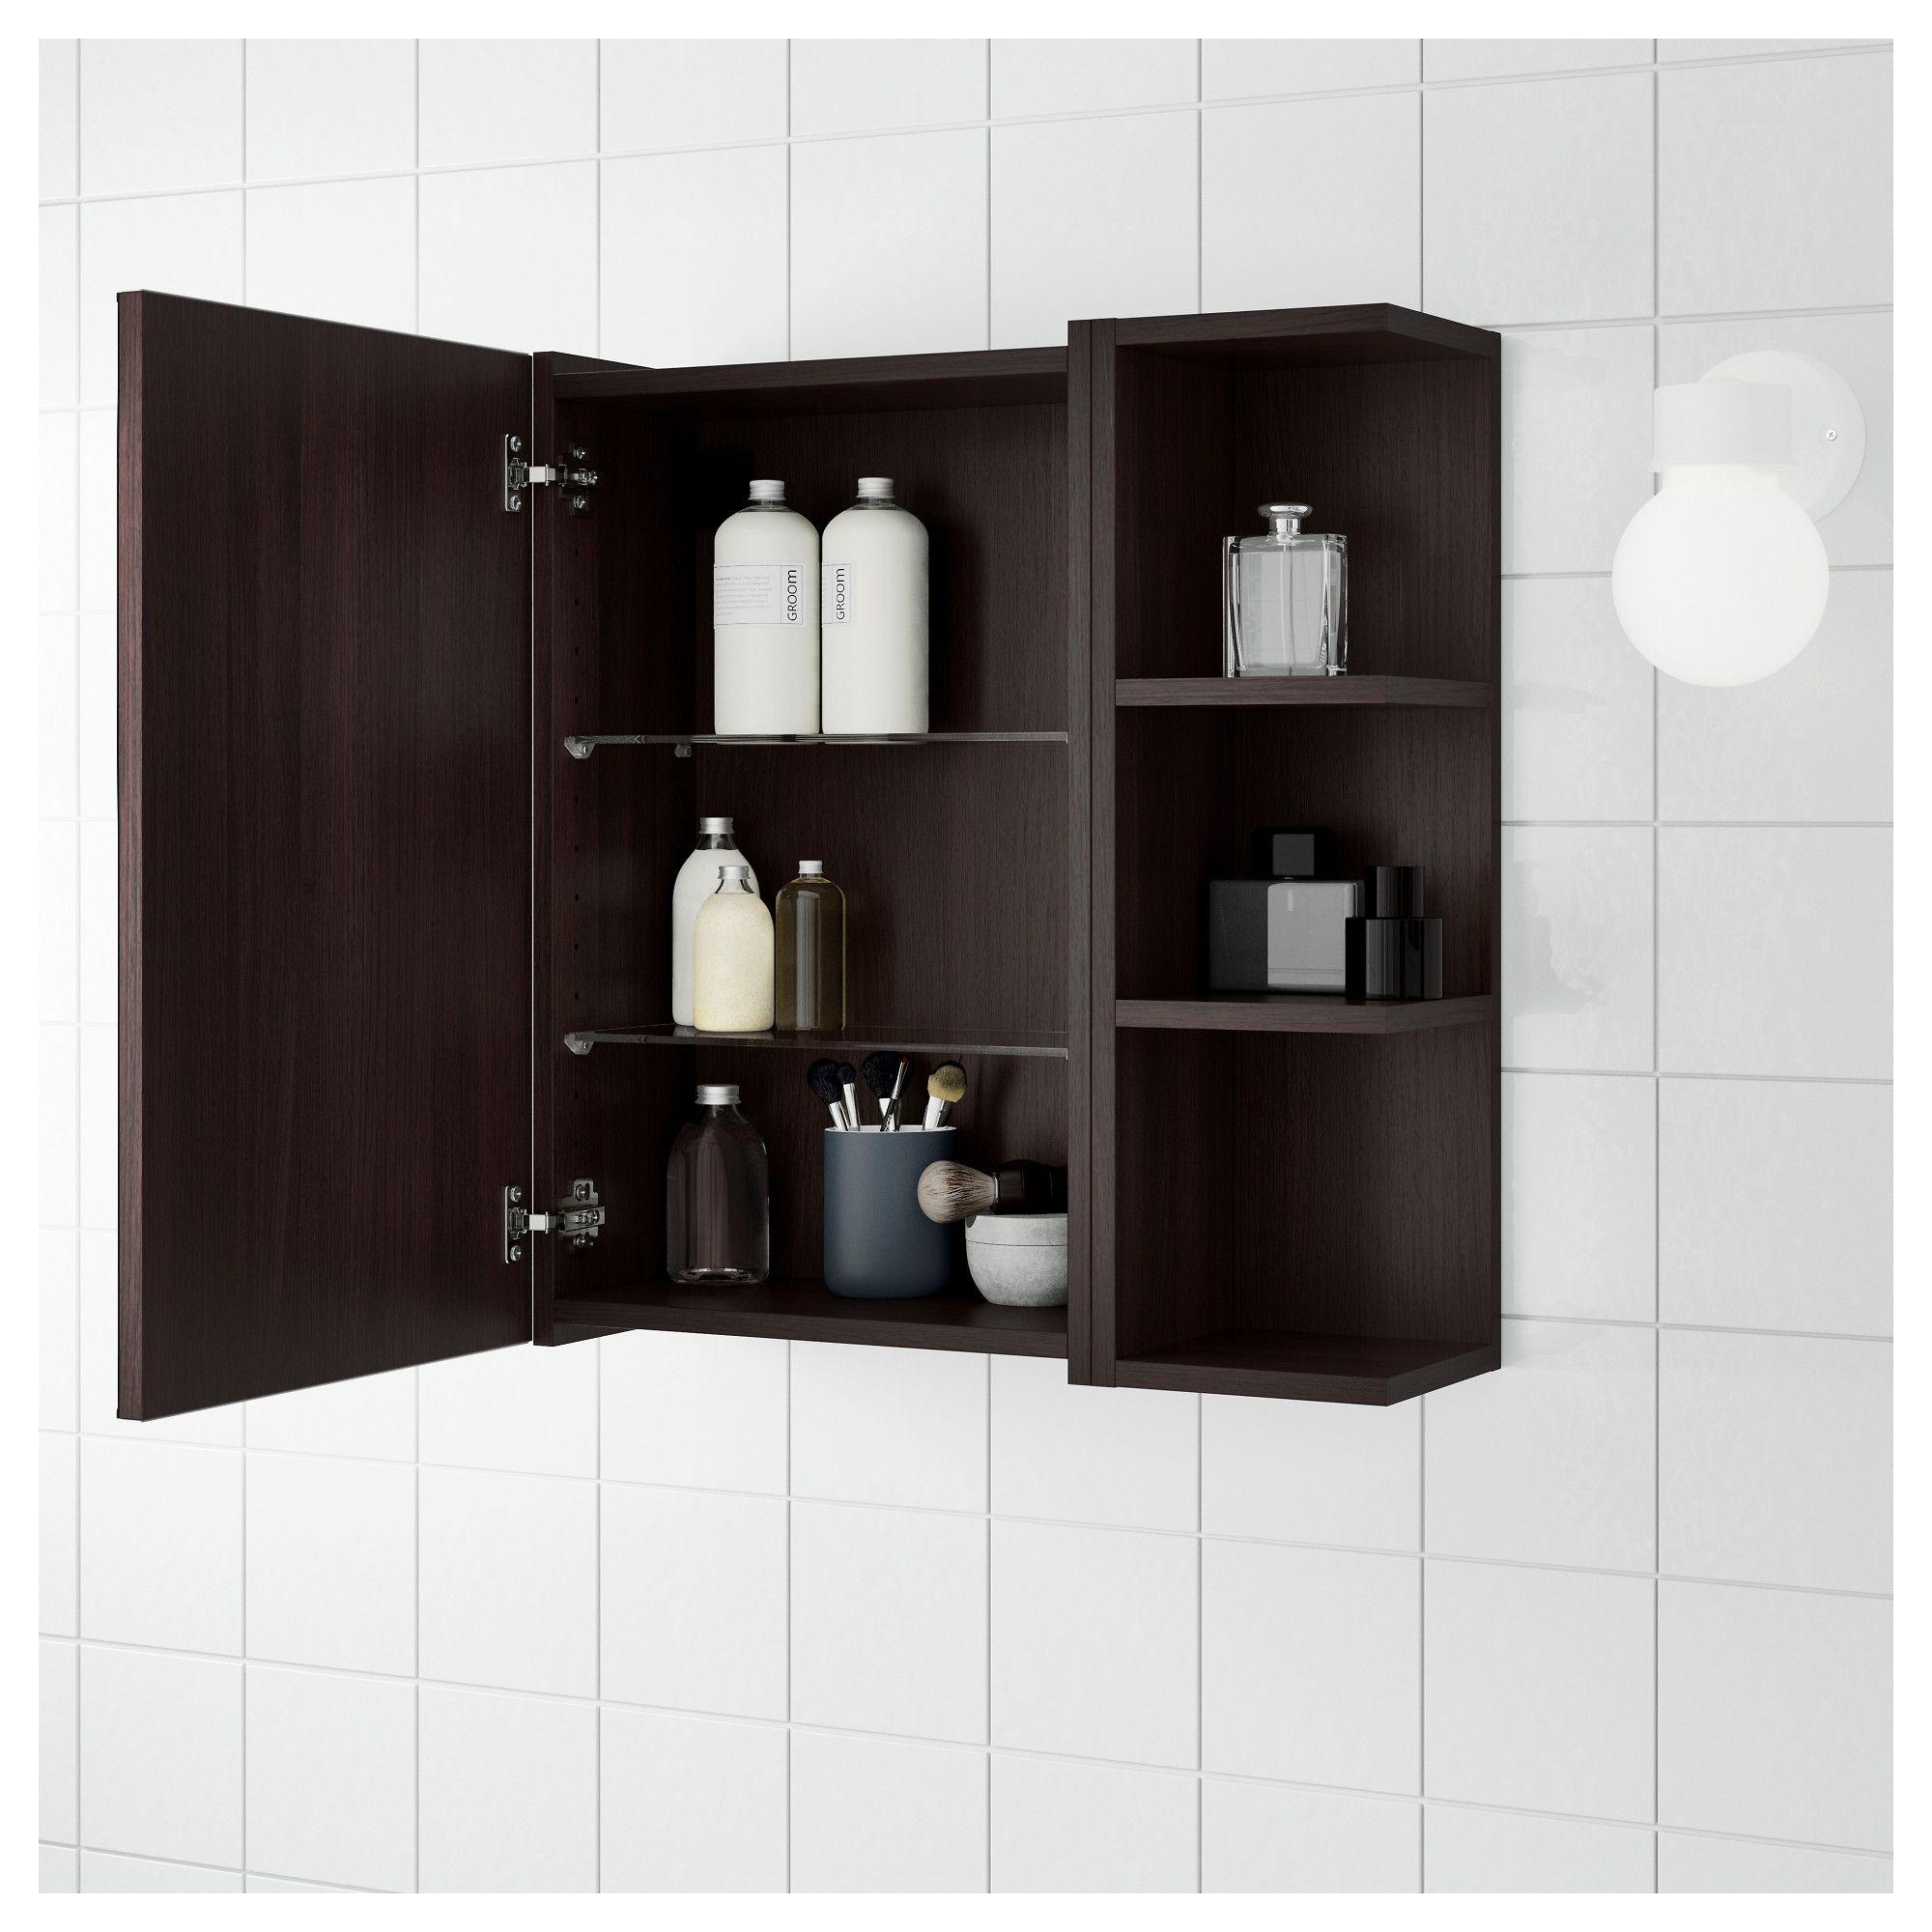 brown bathroom shelving ideas | IKEA - LILLÅNGEN Mirror cabinet 1 door/1 end unit black ...